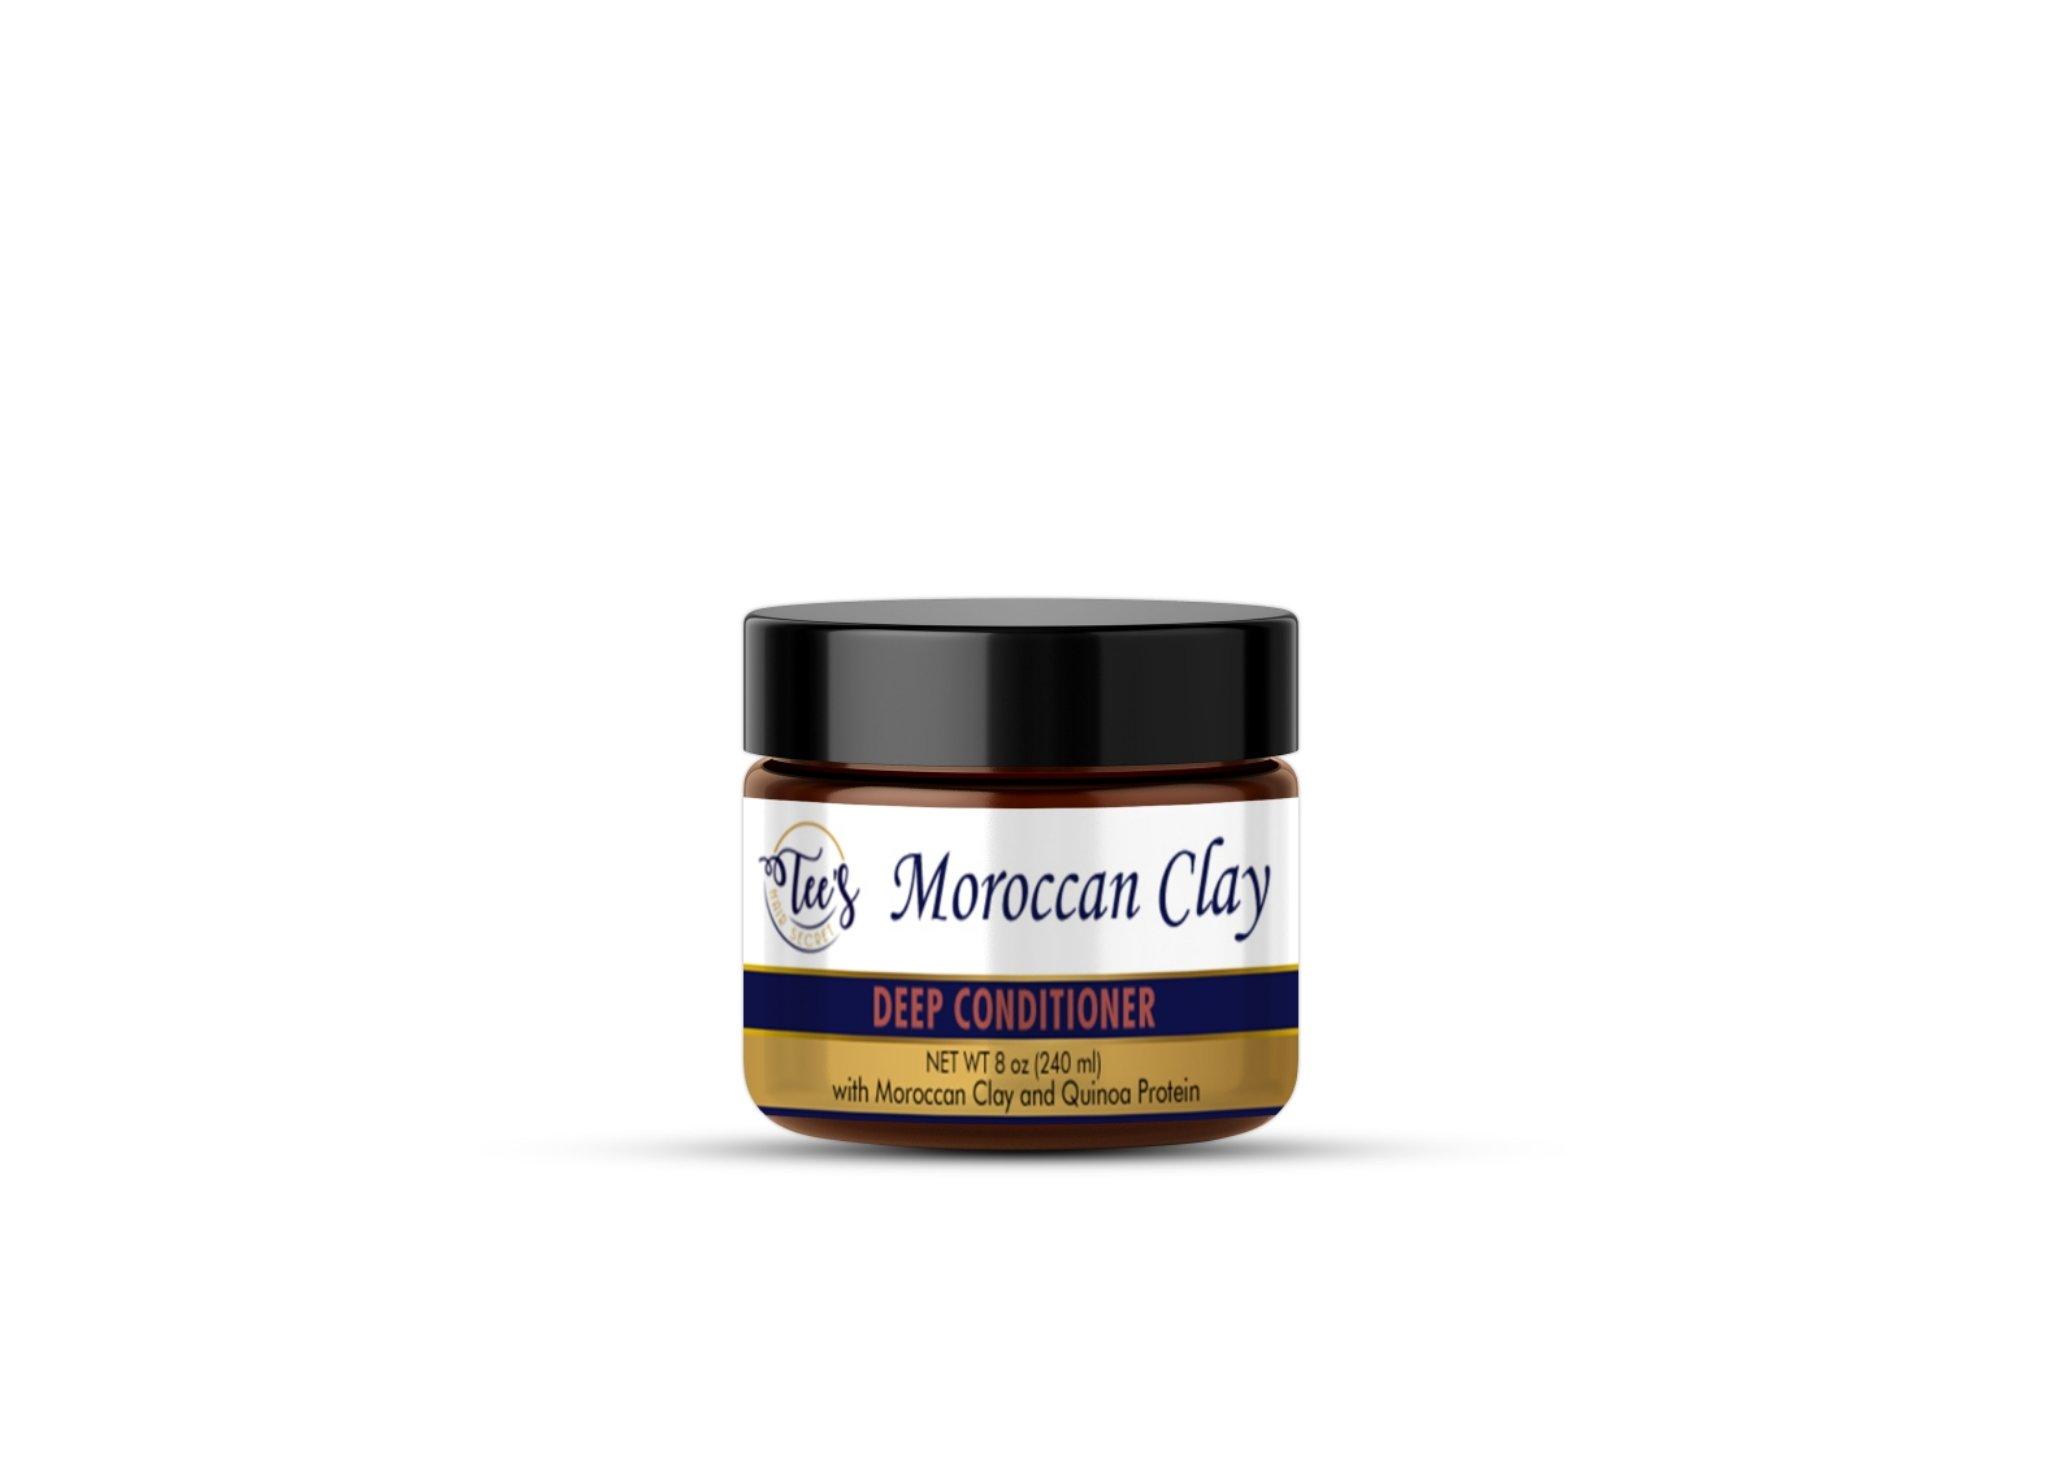 Moroccan Clay Conditioning Set 00039